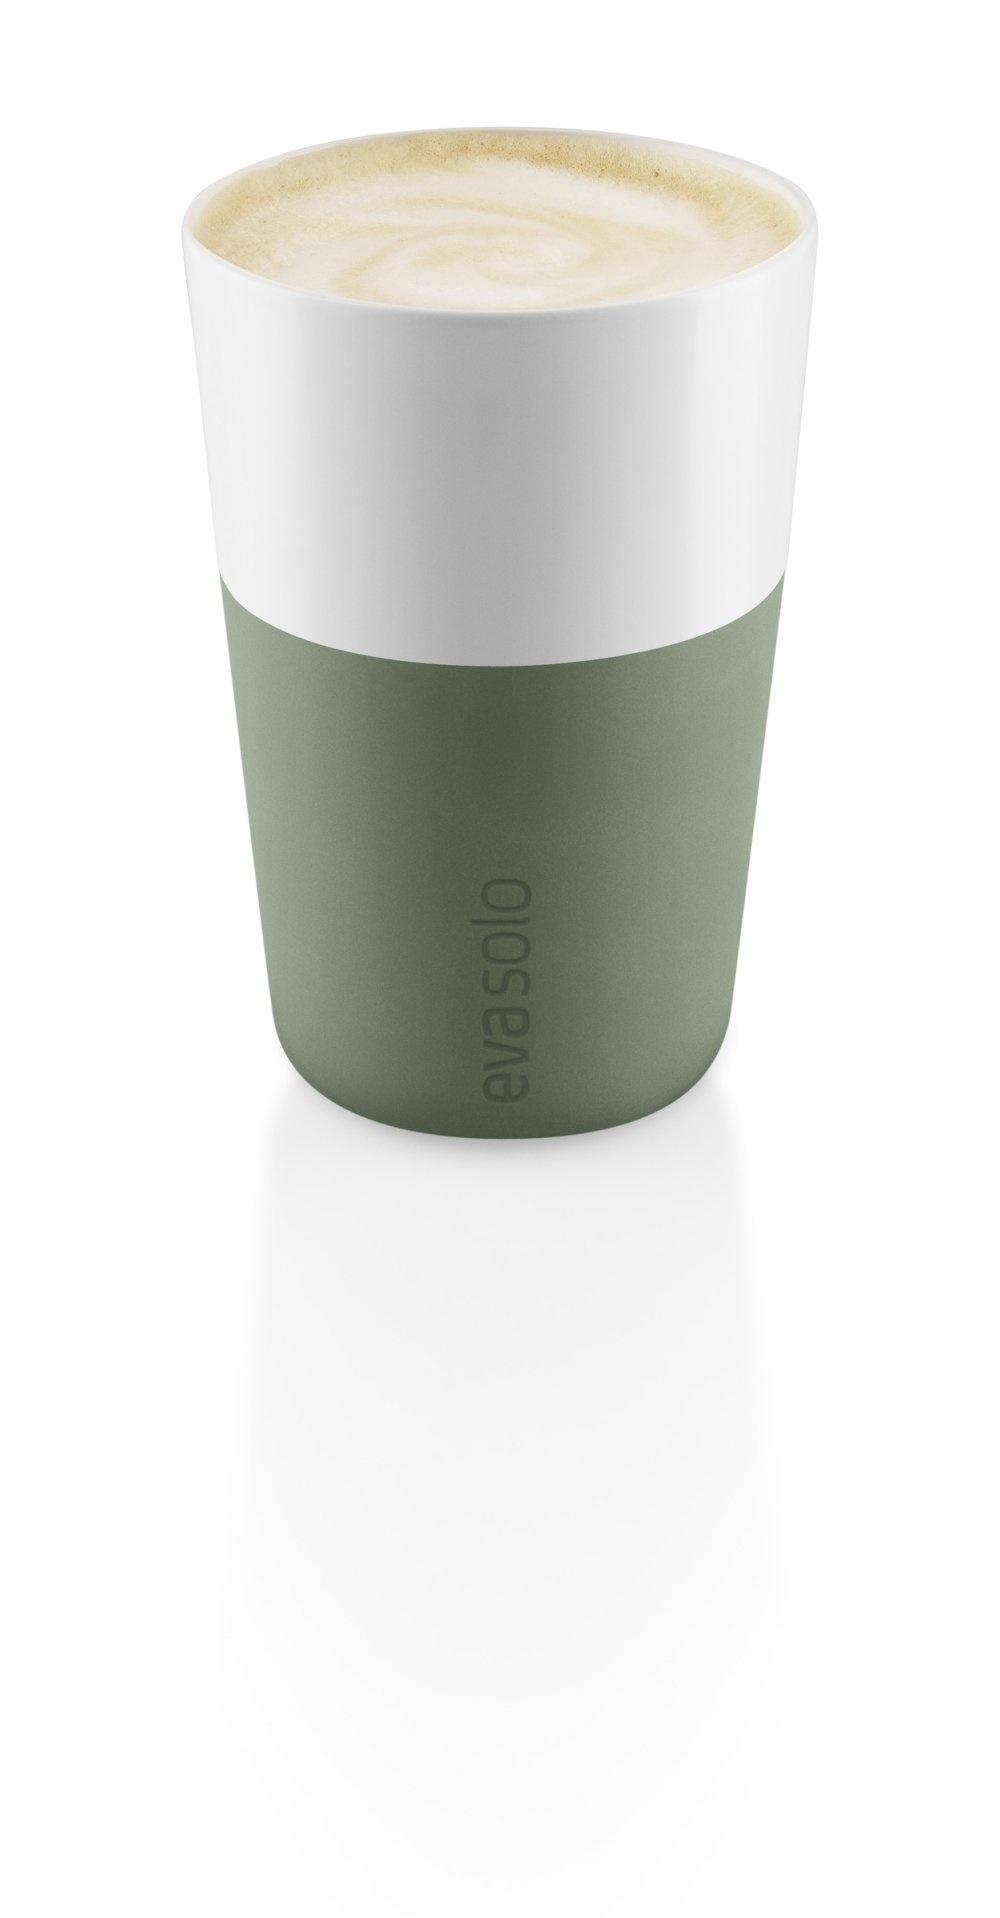 Eva Solo Koffie Latte Bekers Cactus Green Set van 2